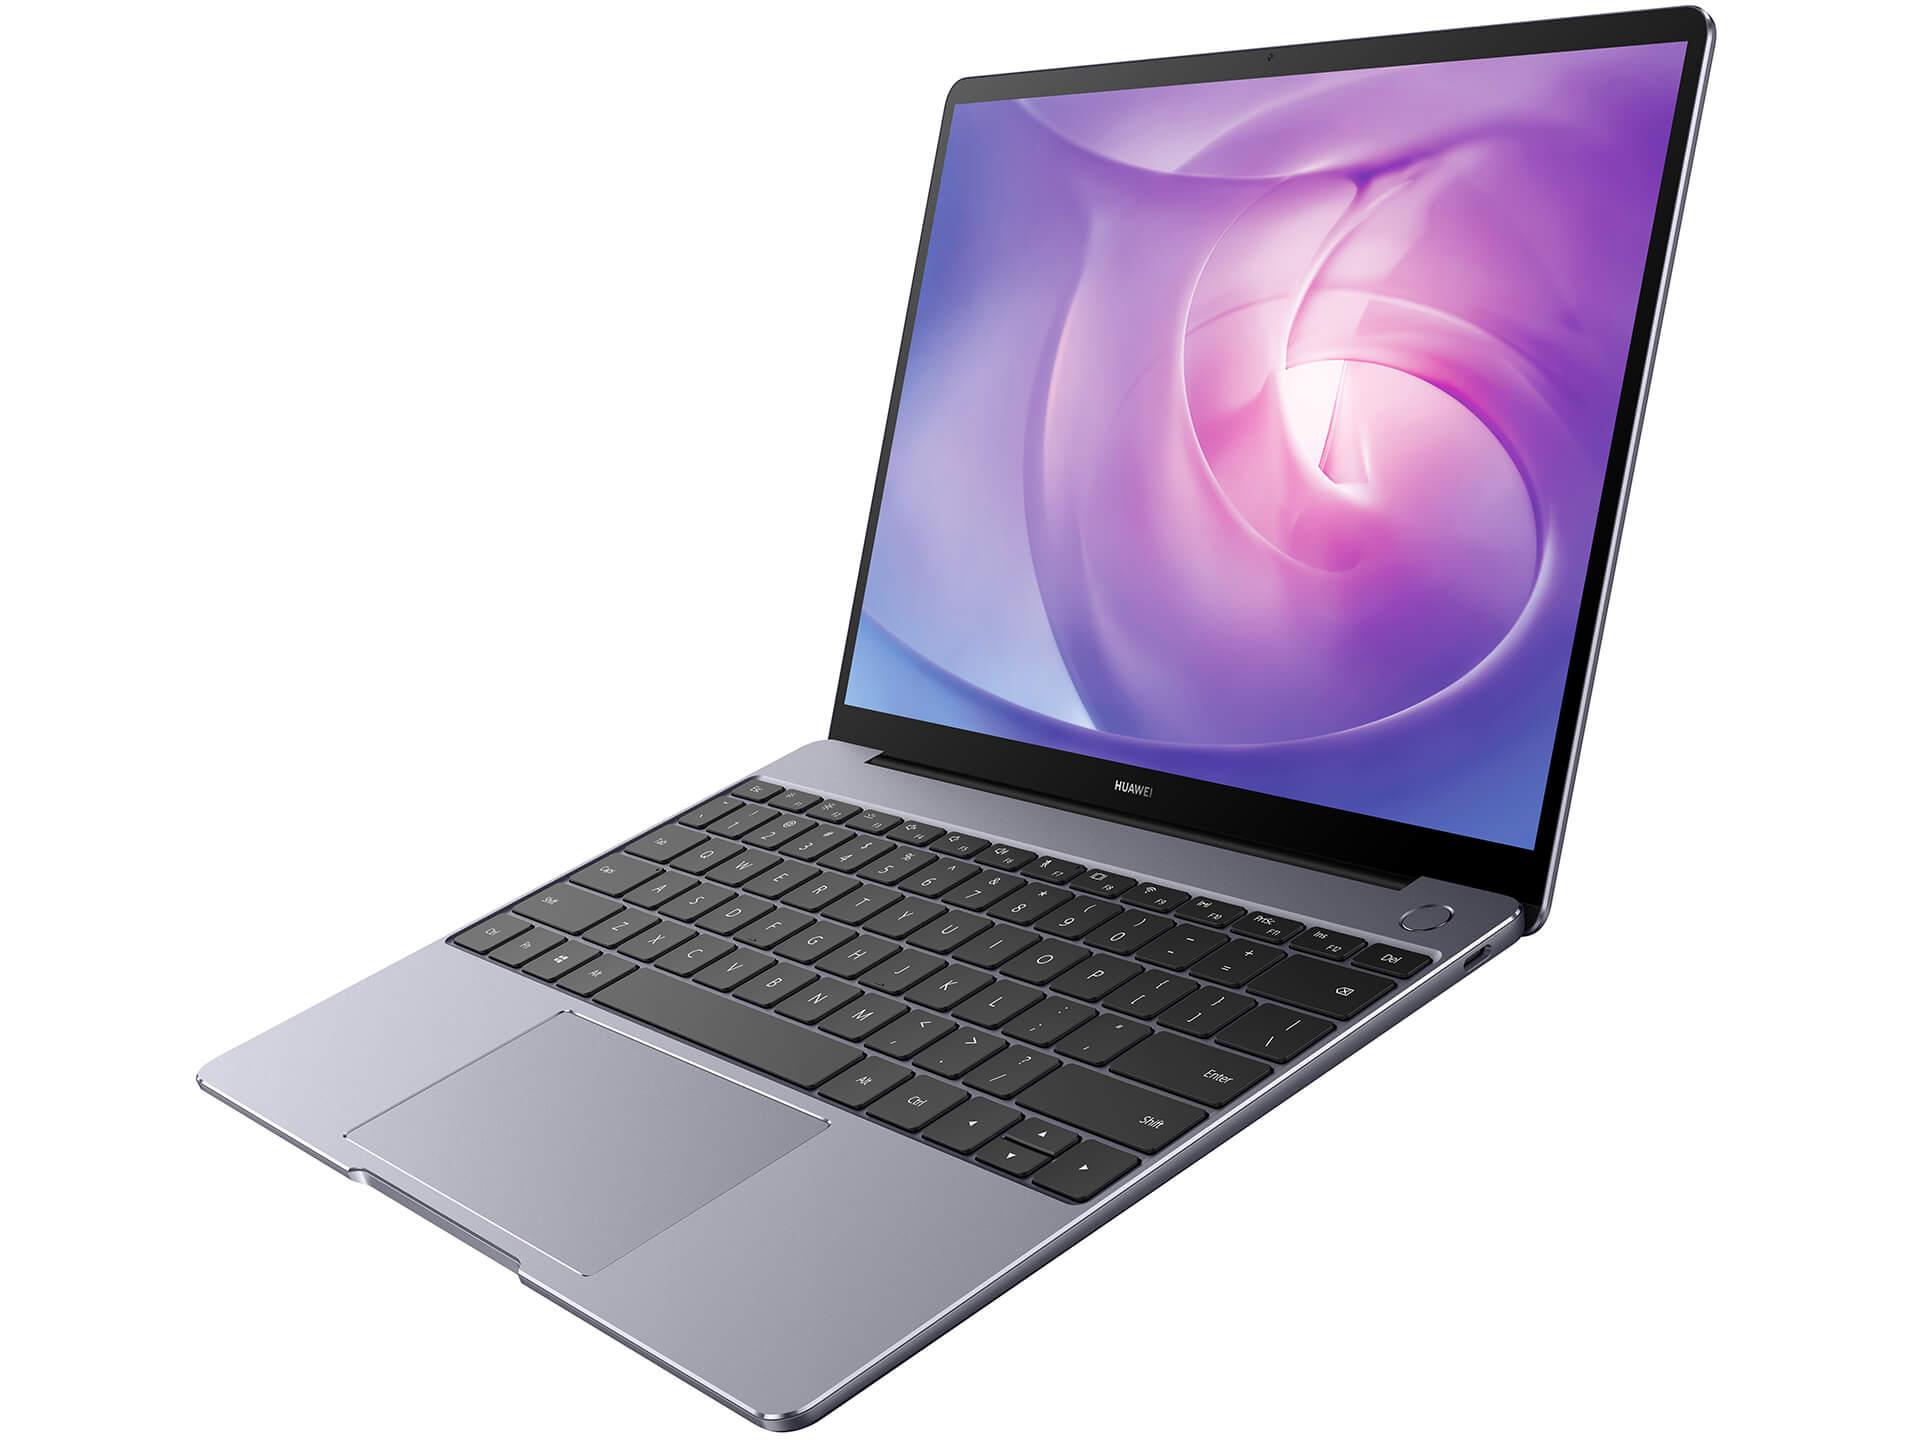 The MateBook 13